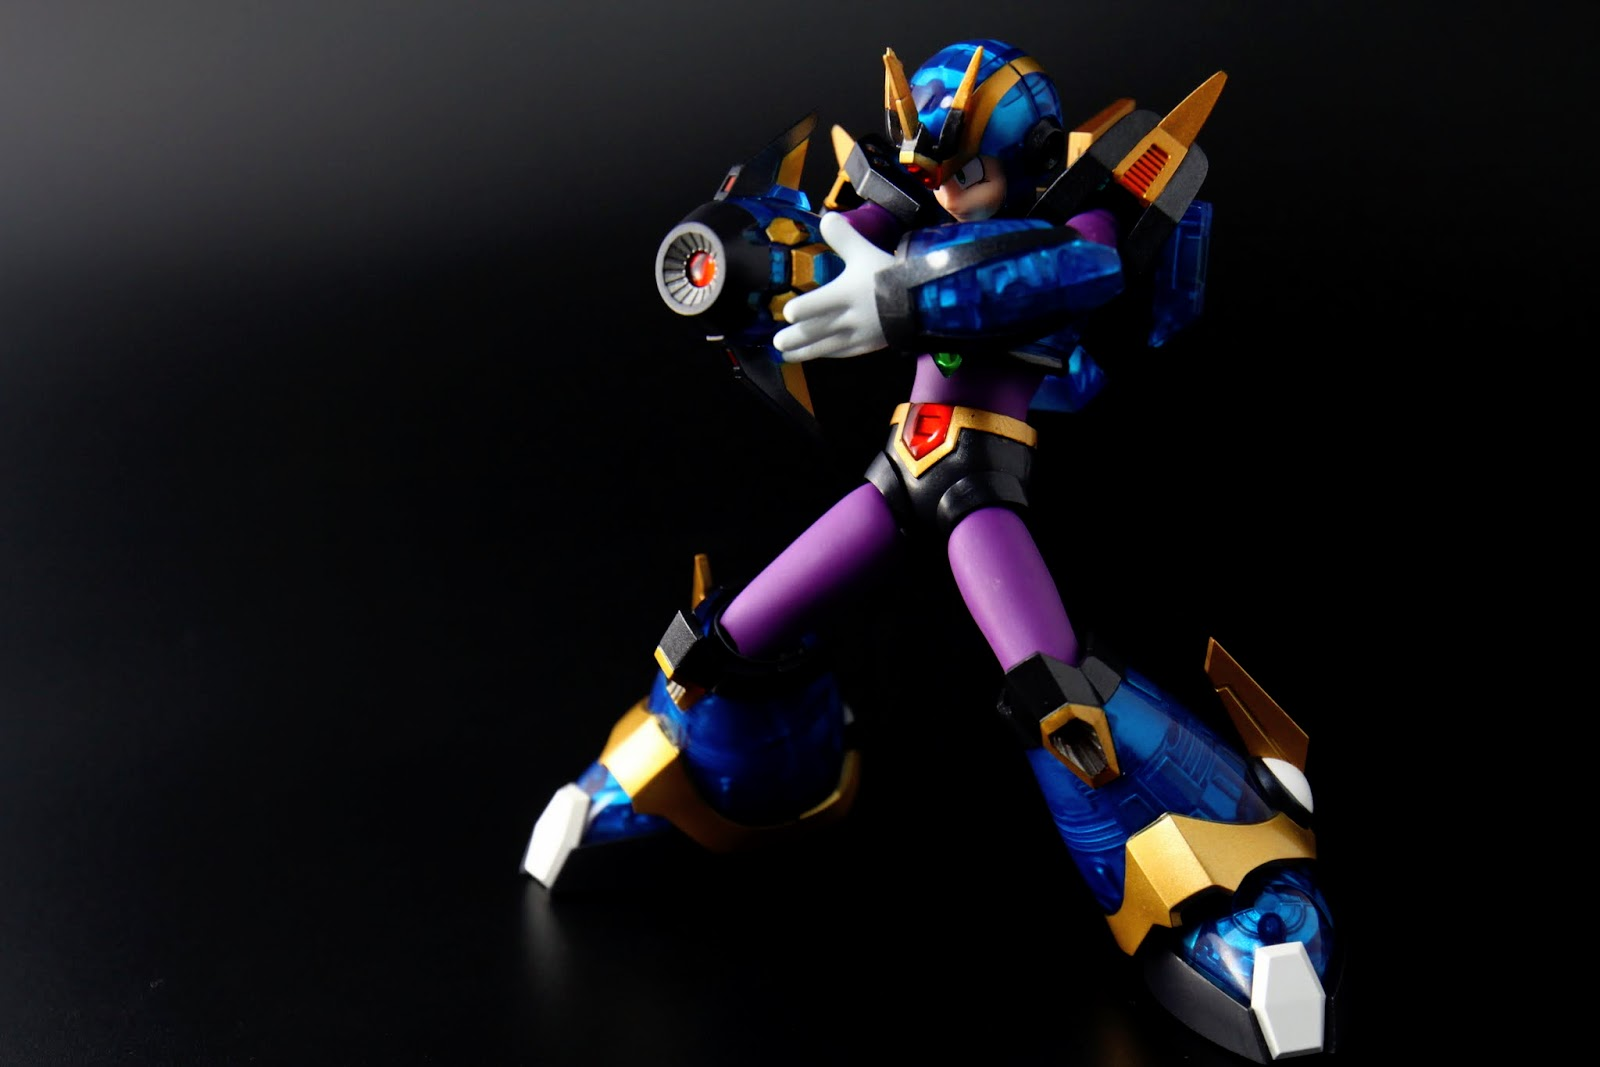 X4裡拿到究極鎧甲後很少再用手砲攻擊了,雖然攻擊力也很誇張